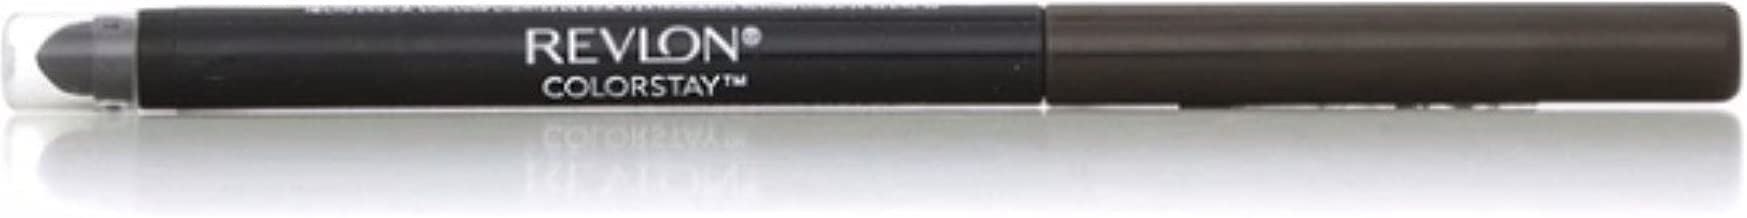 Revlon ColorStay Eyeliner Pencil, Black Brown [202], 0.01 oz (Pack of 5)